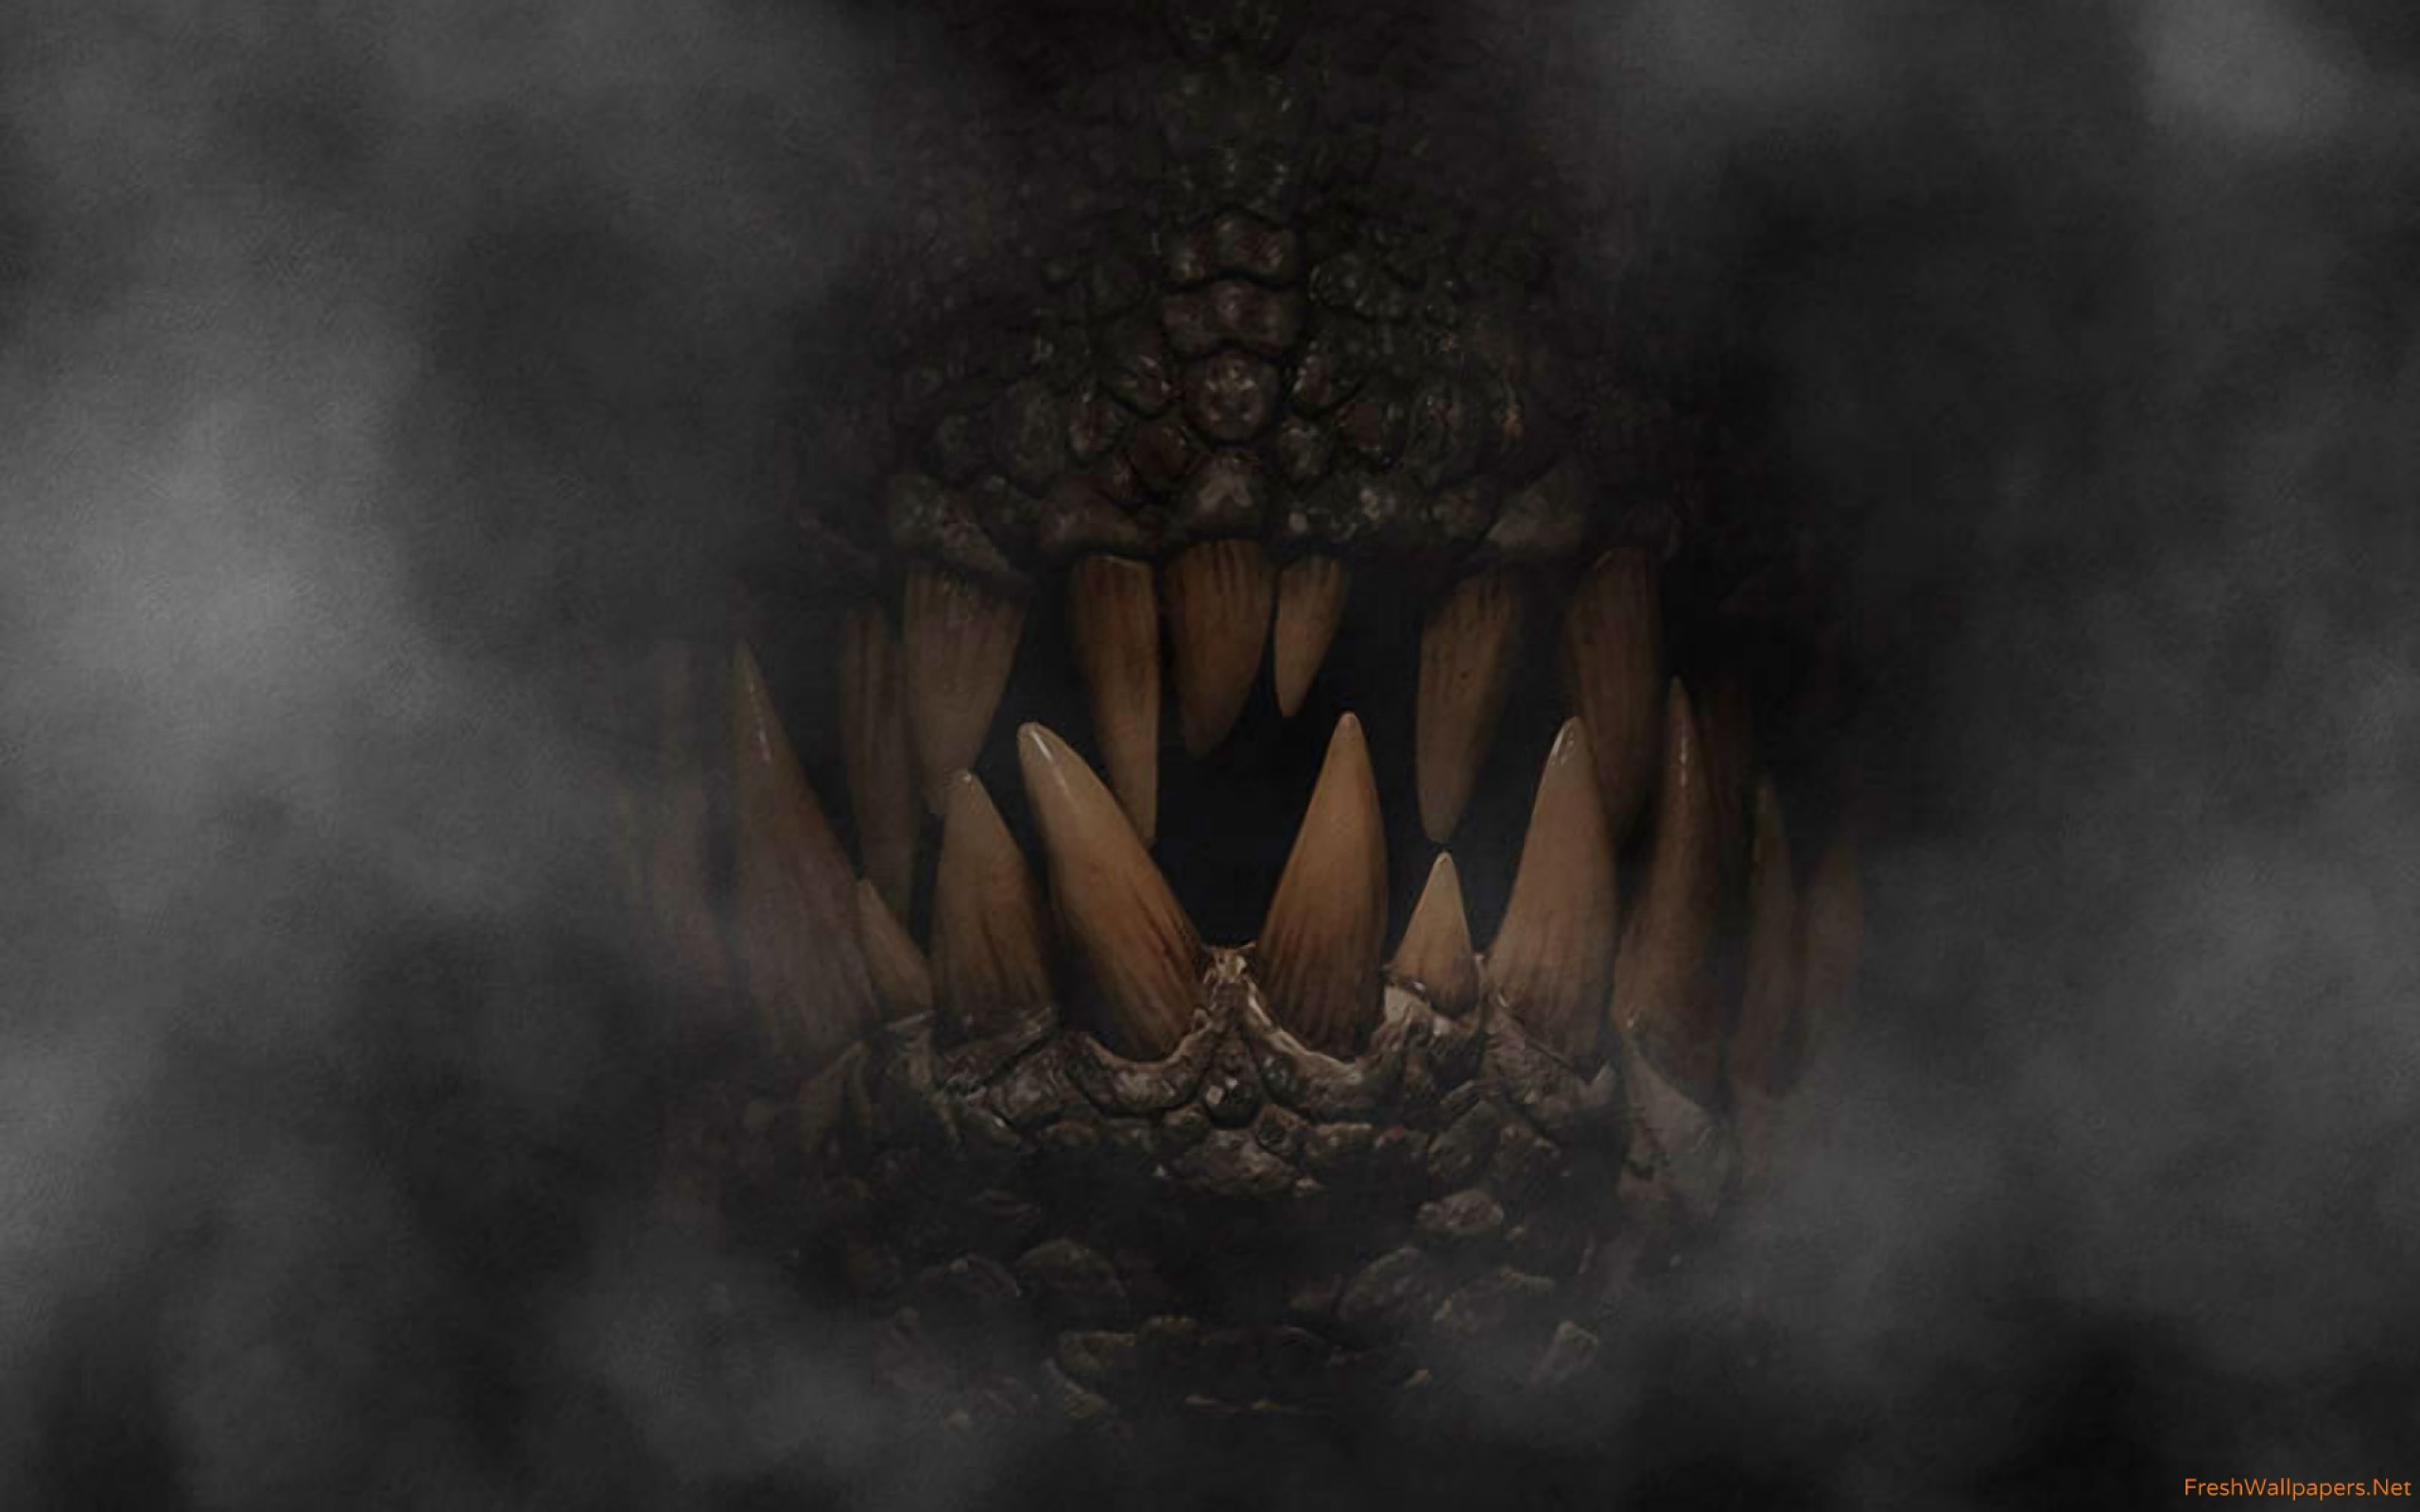 Res: 2560x1600, dinosaur-indominus-rex-jurassic-world Wallpaper: